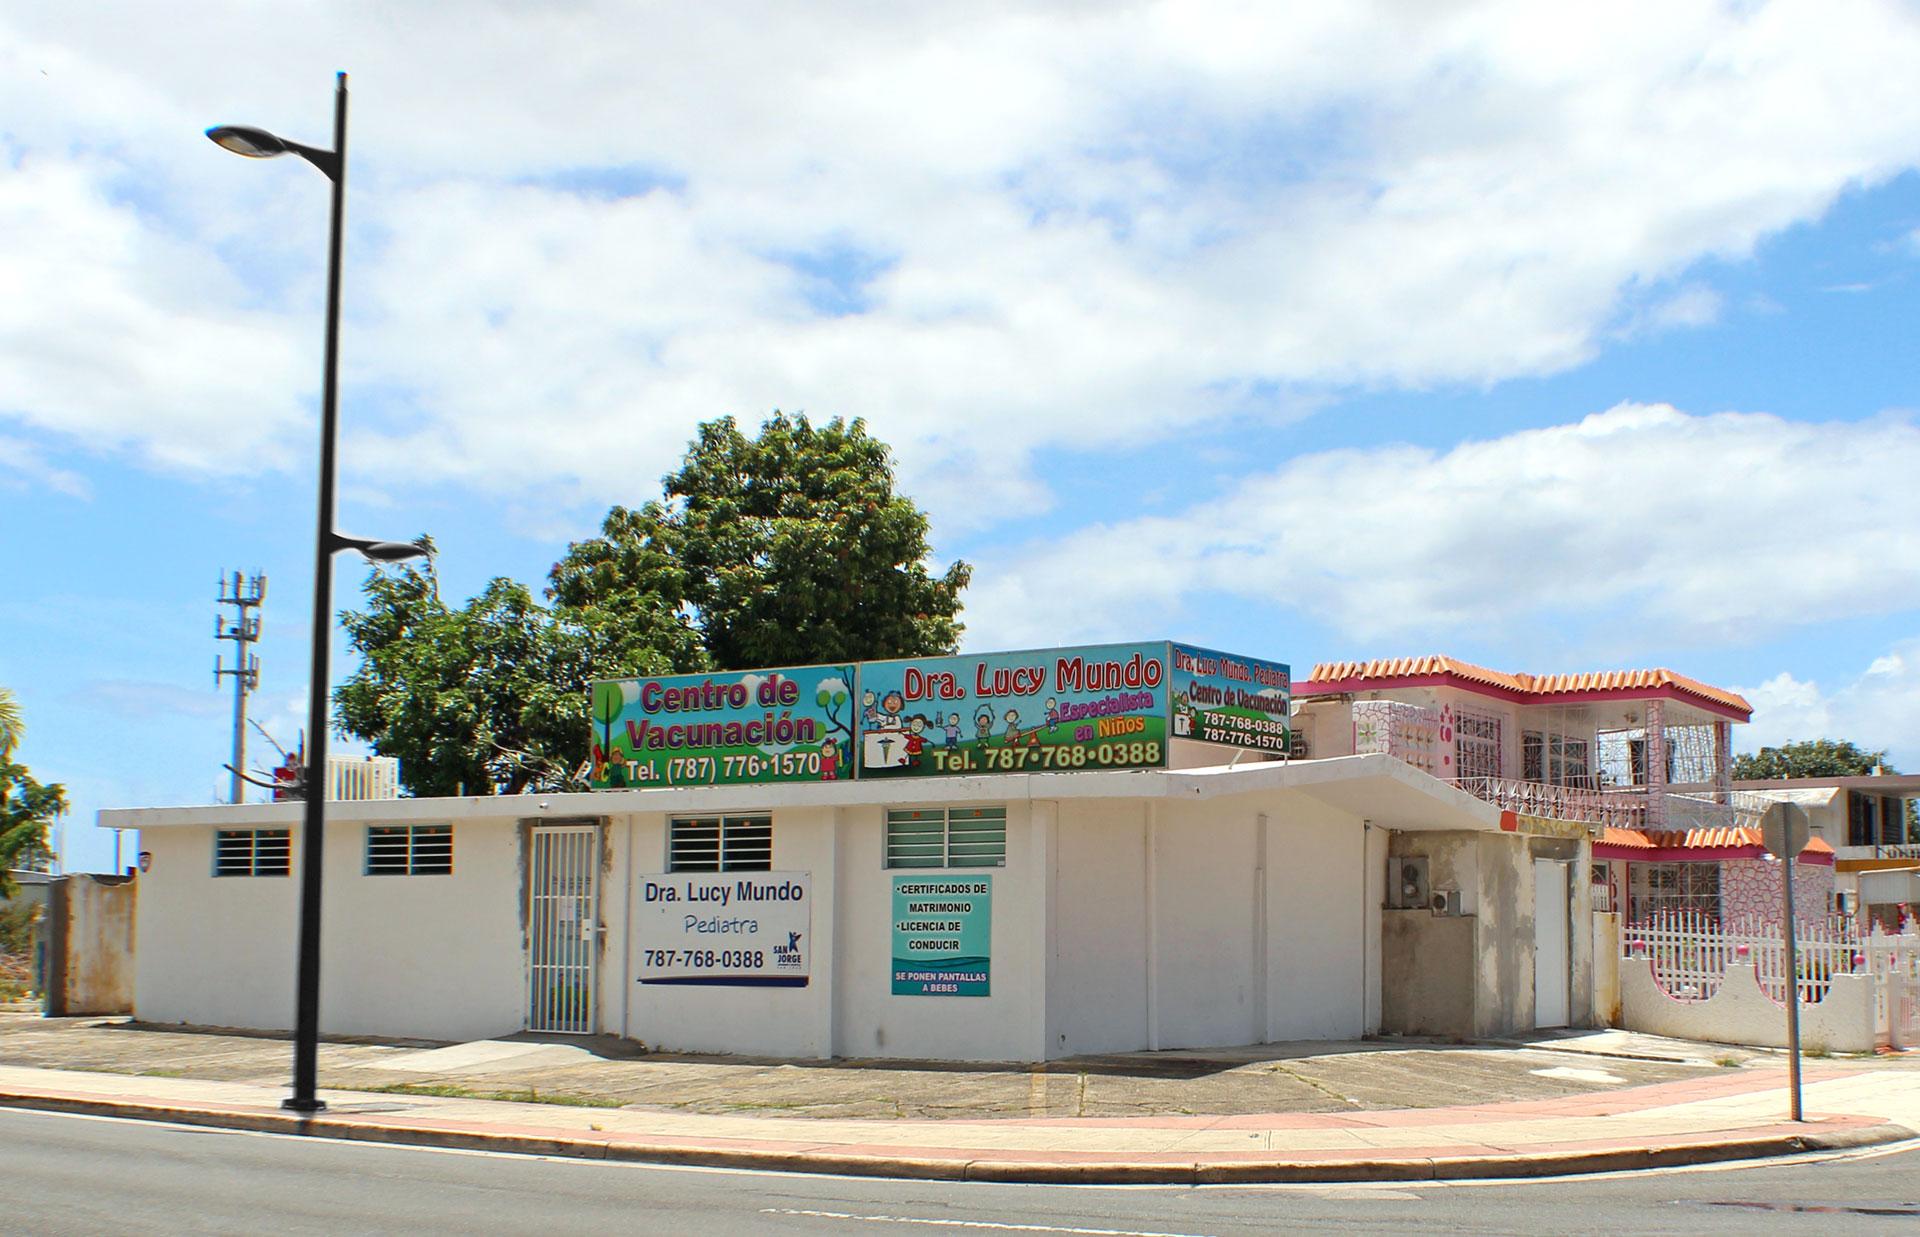 Pediatra Dra. Lucy Mundo, Carolina, Puerto Rico.